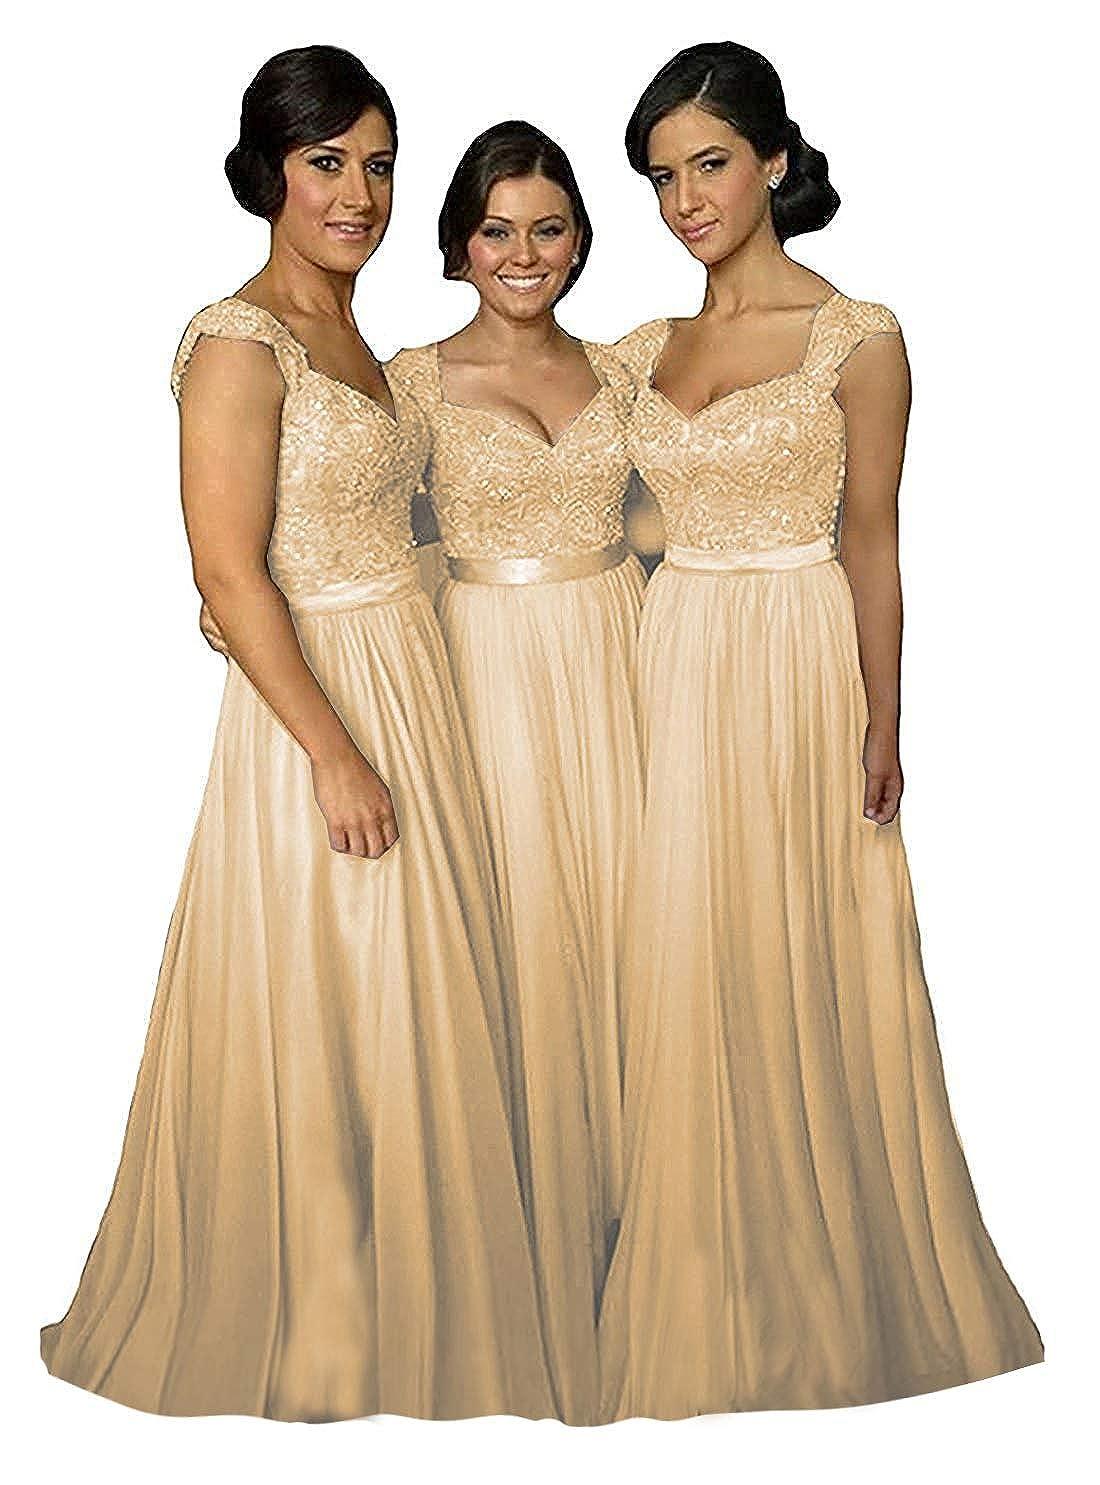 Champagne Fanciest Women' Cap Sleeve Lace Bridesmaid Dresses Long Wedding Party Gowns